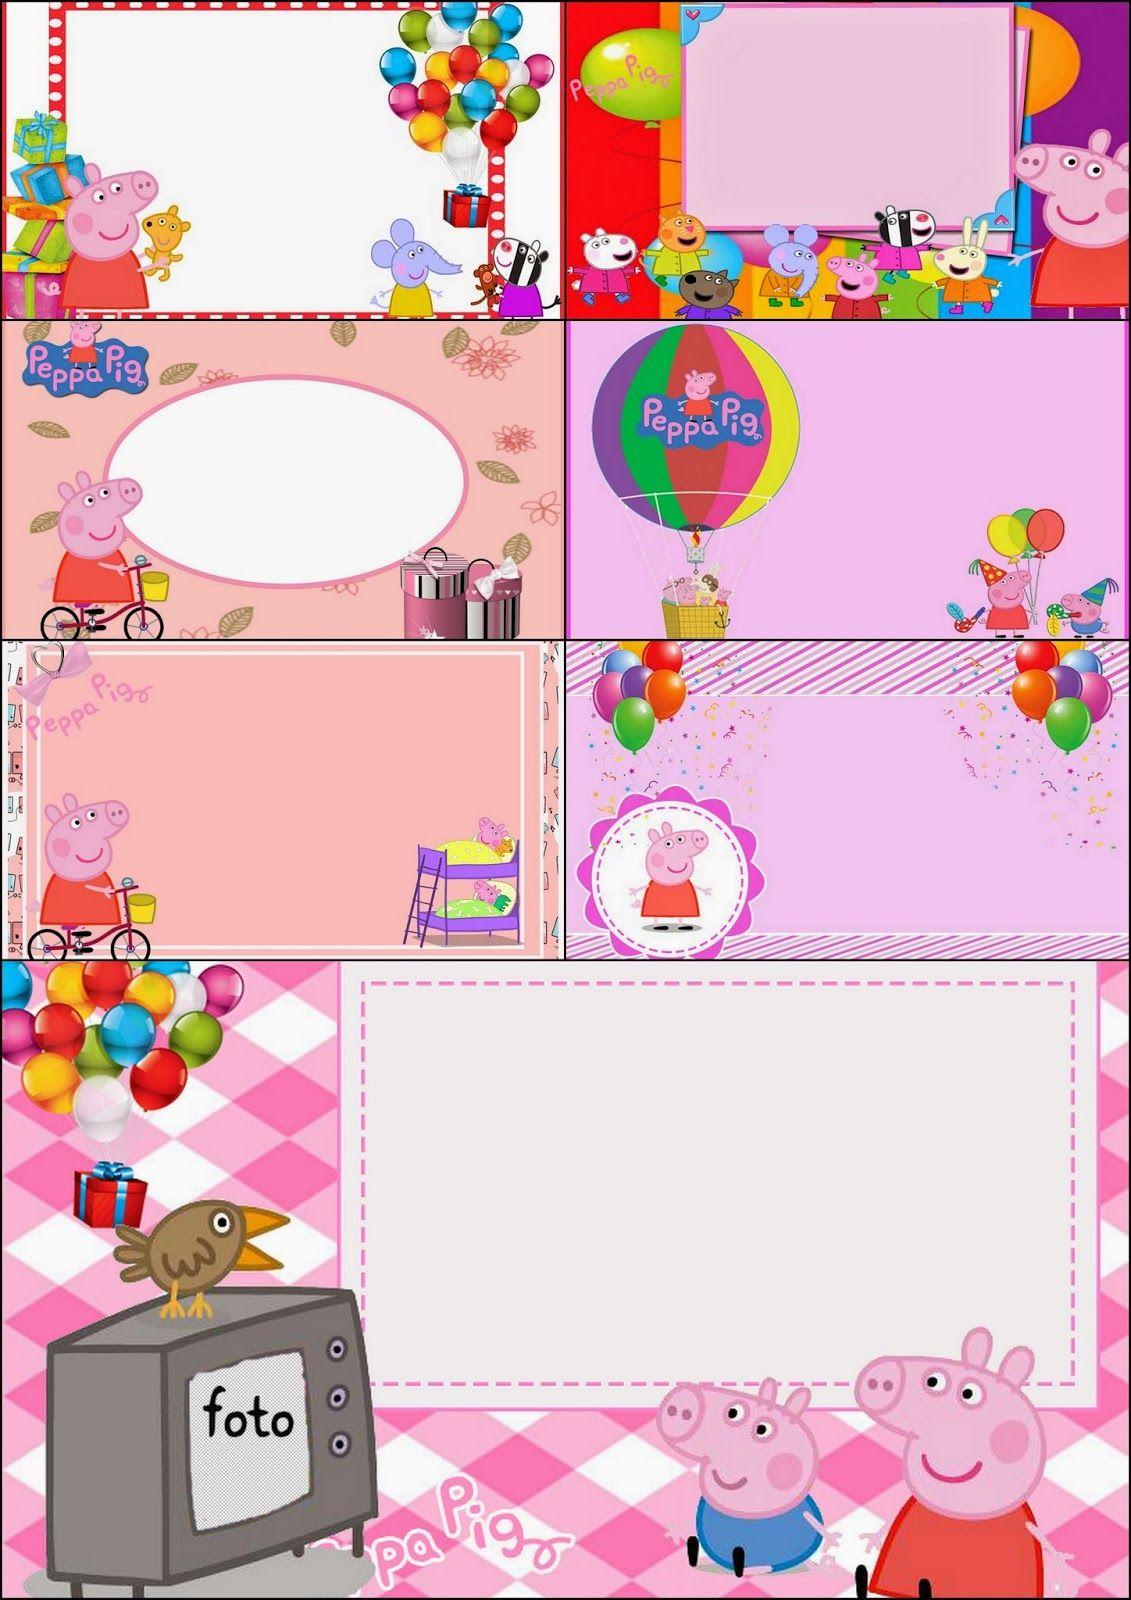 Peppa Pig: Free Printable Invitations, Labels or Cards. | keretek ...